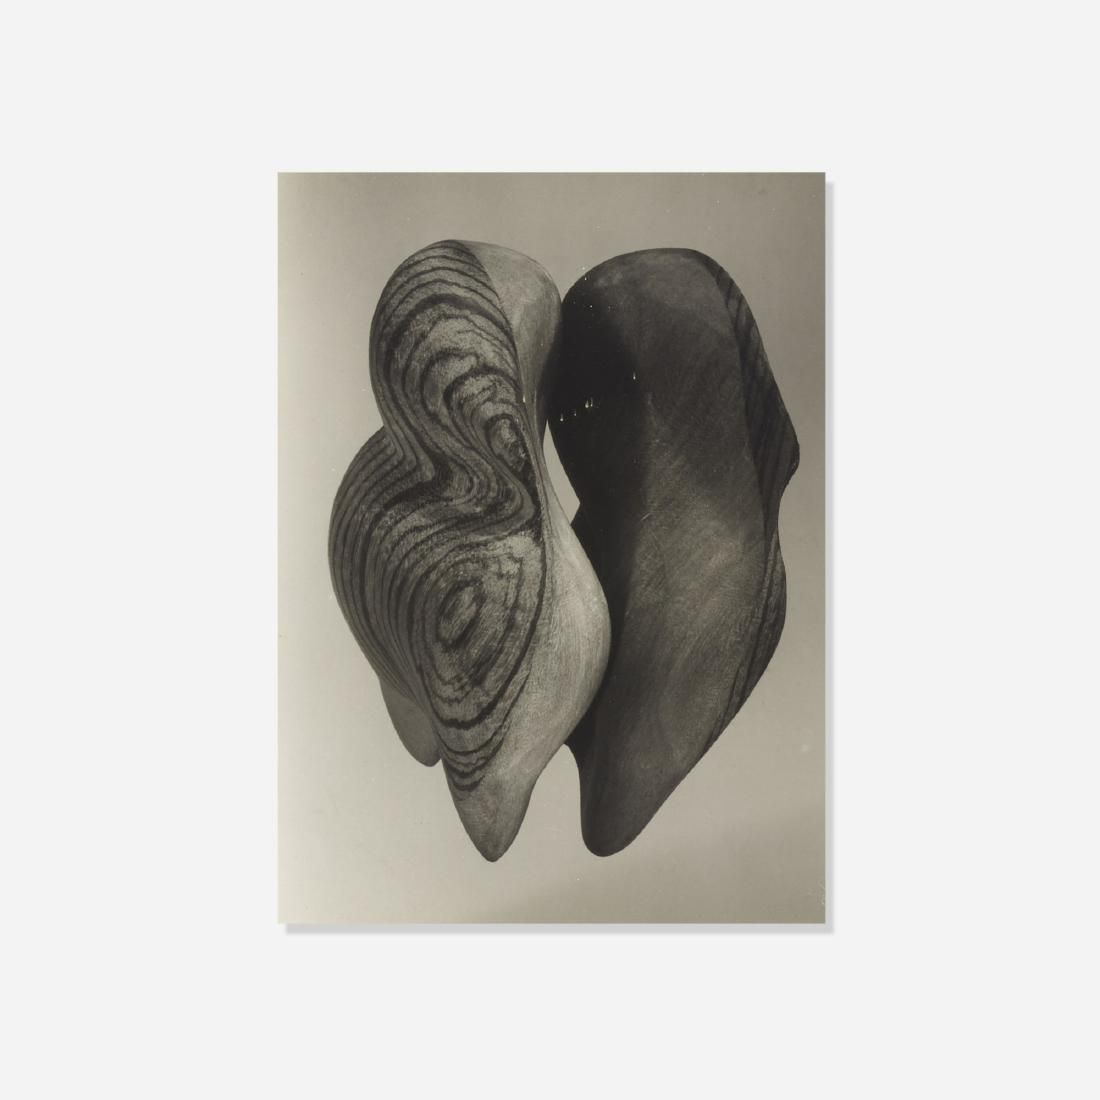 Barbara Morgan, Untitled